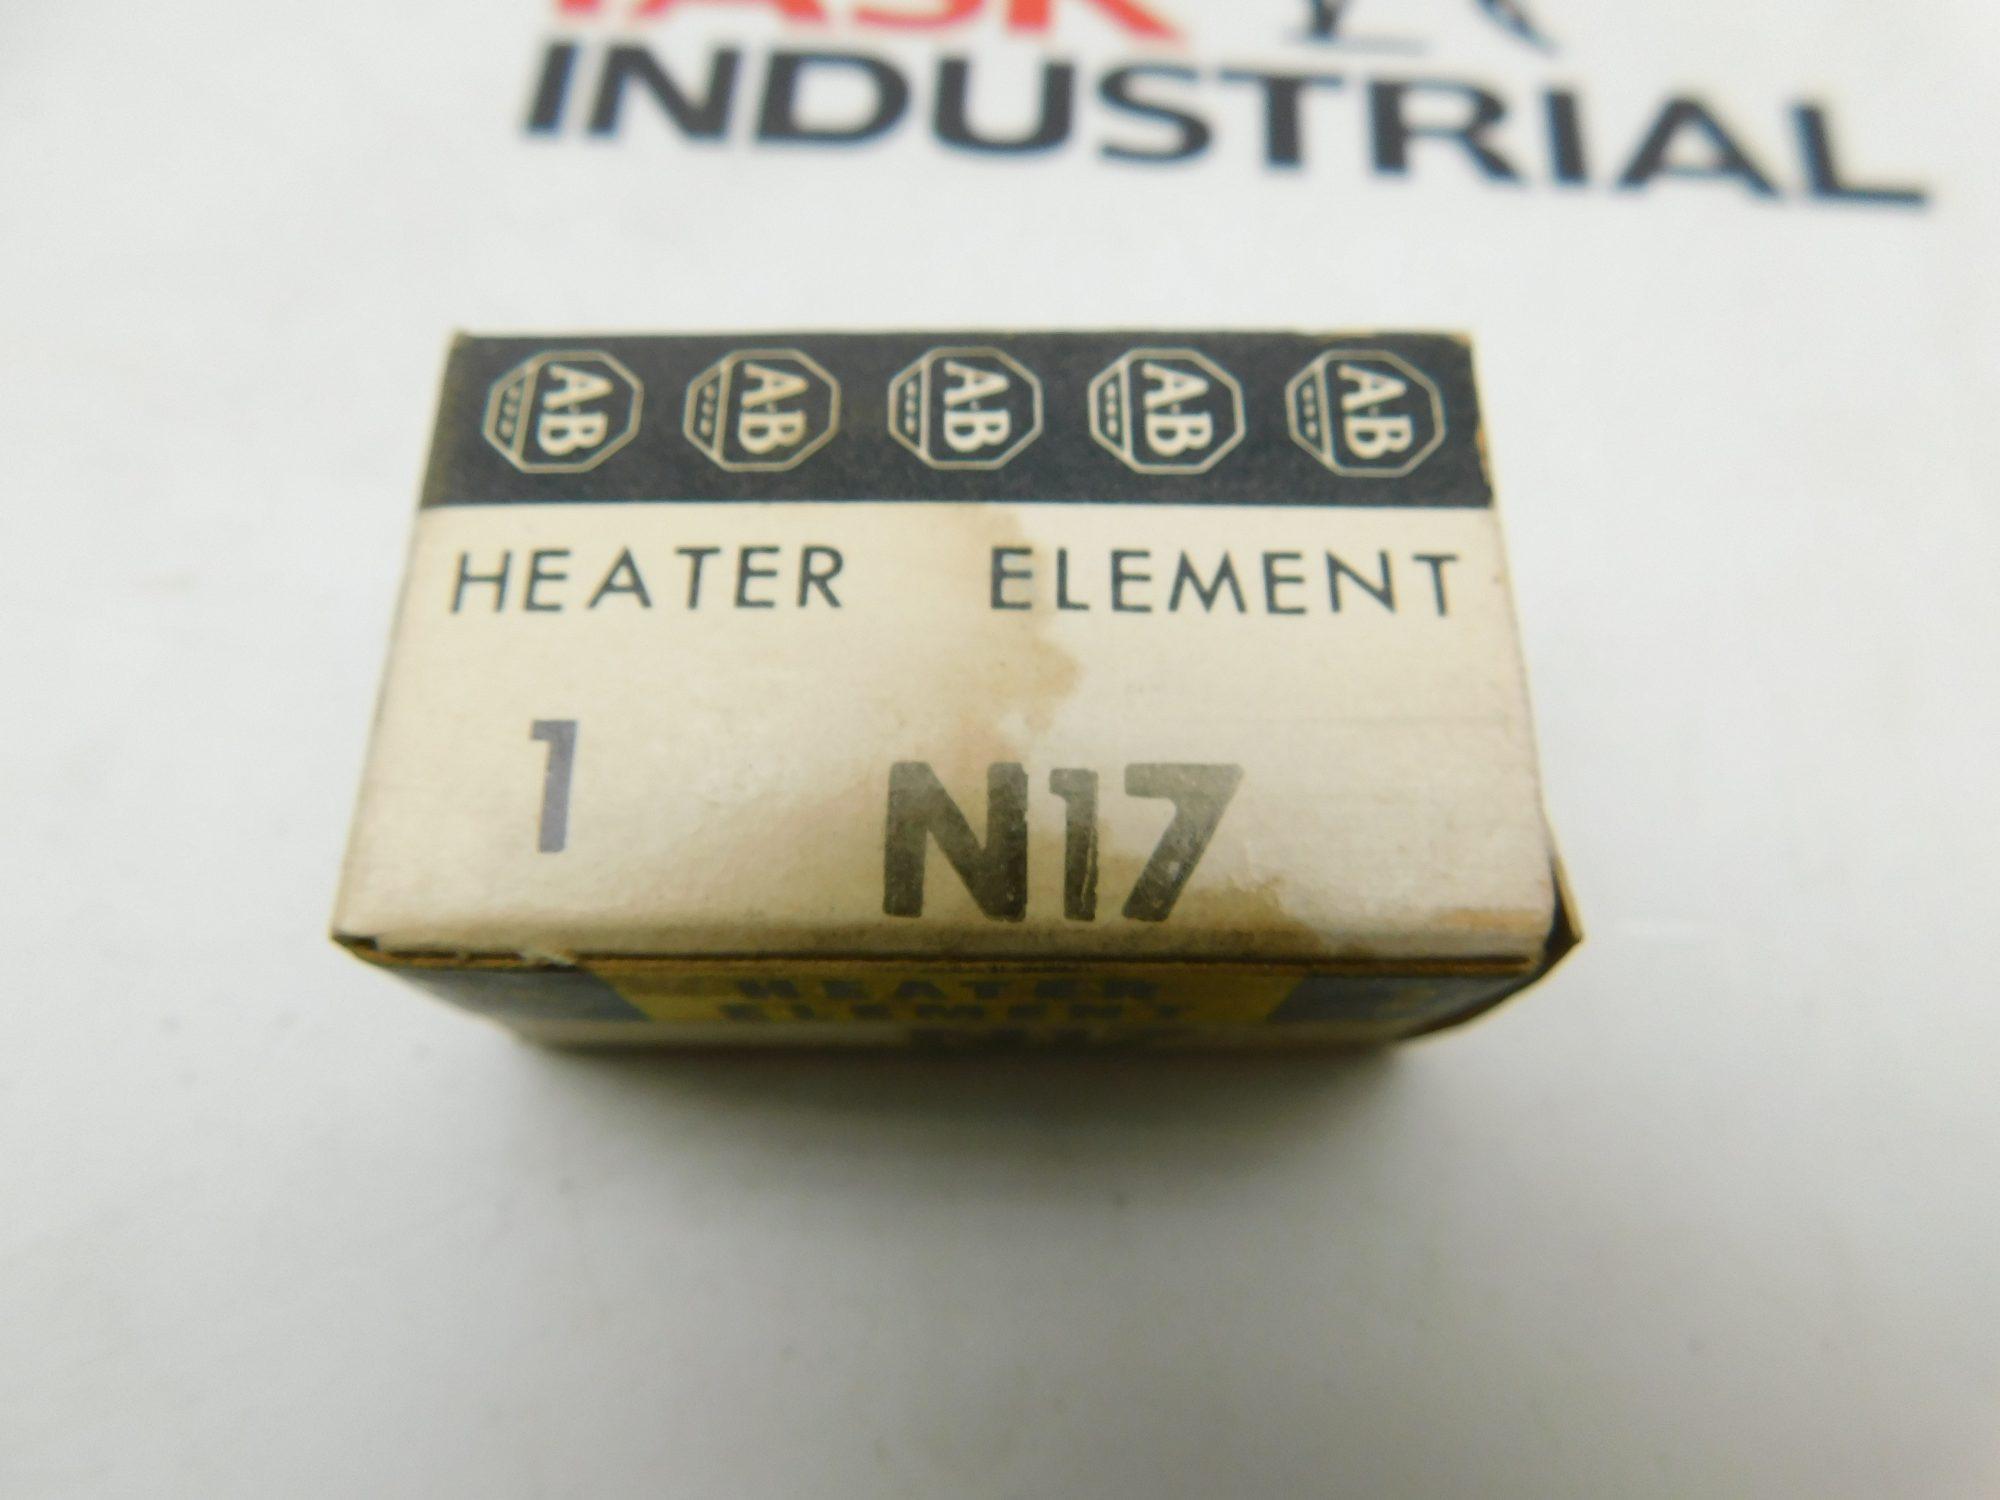 Allen-Bradley N17 Heater Element